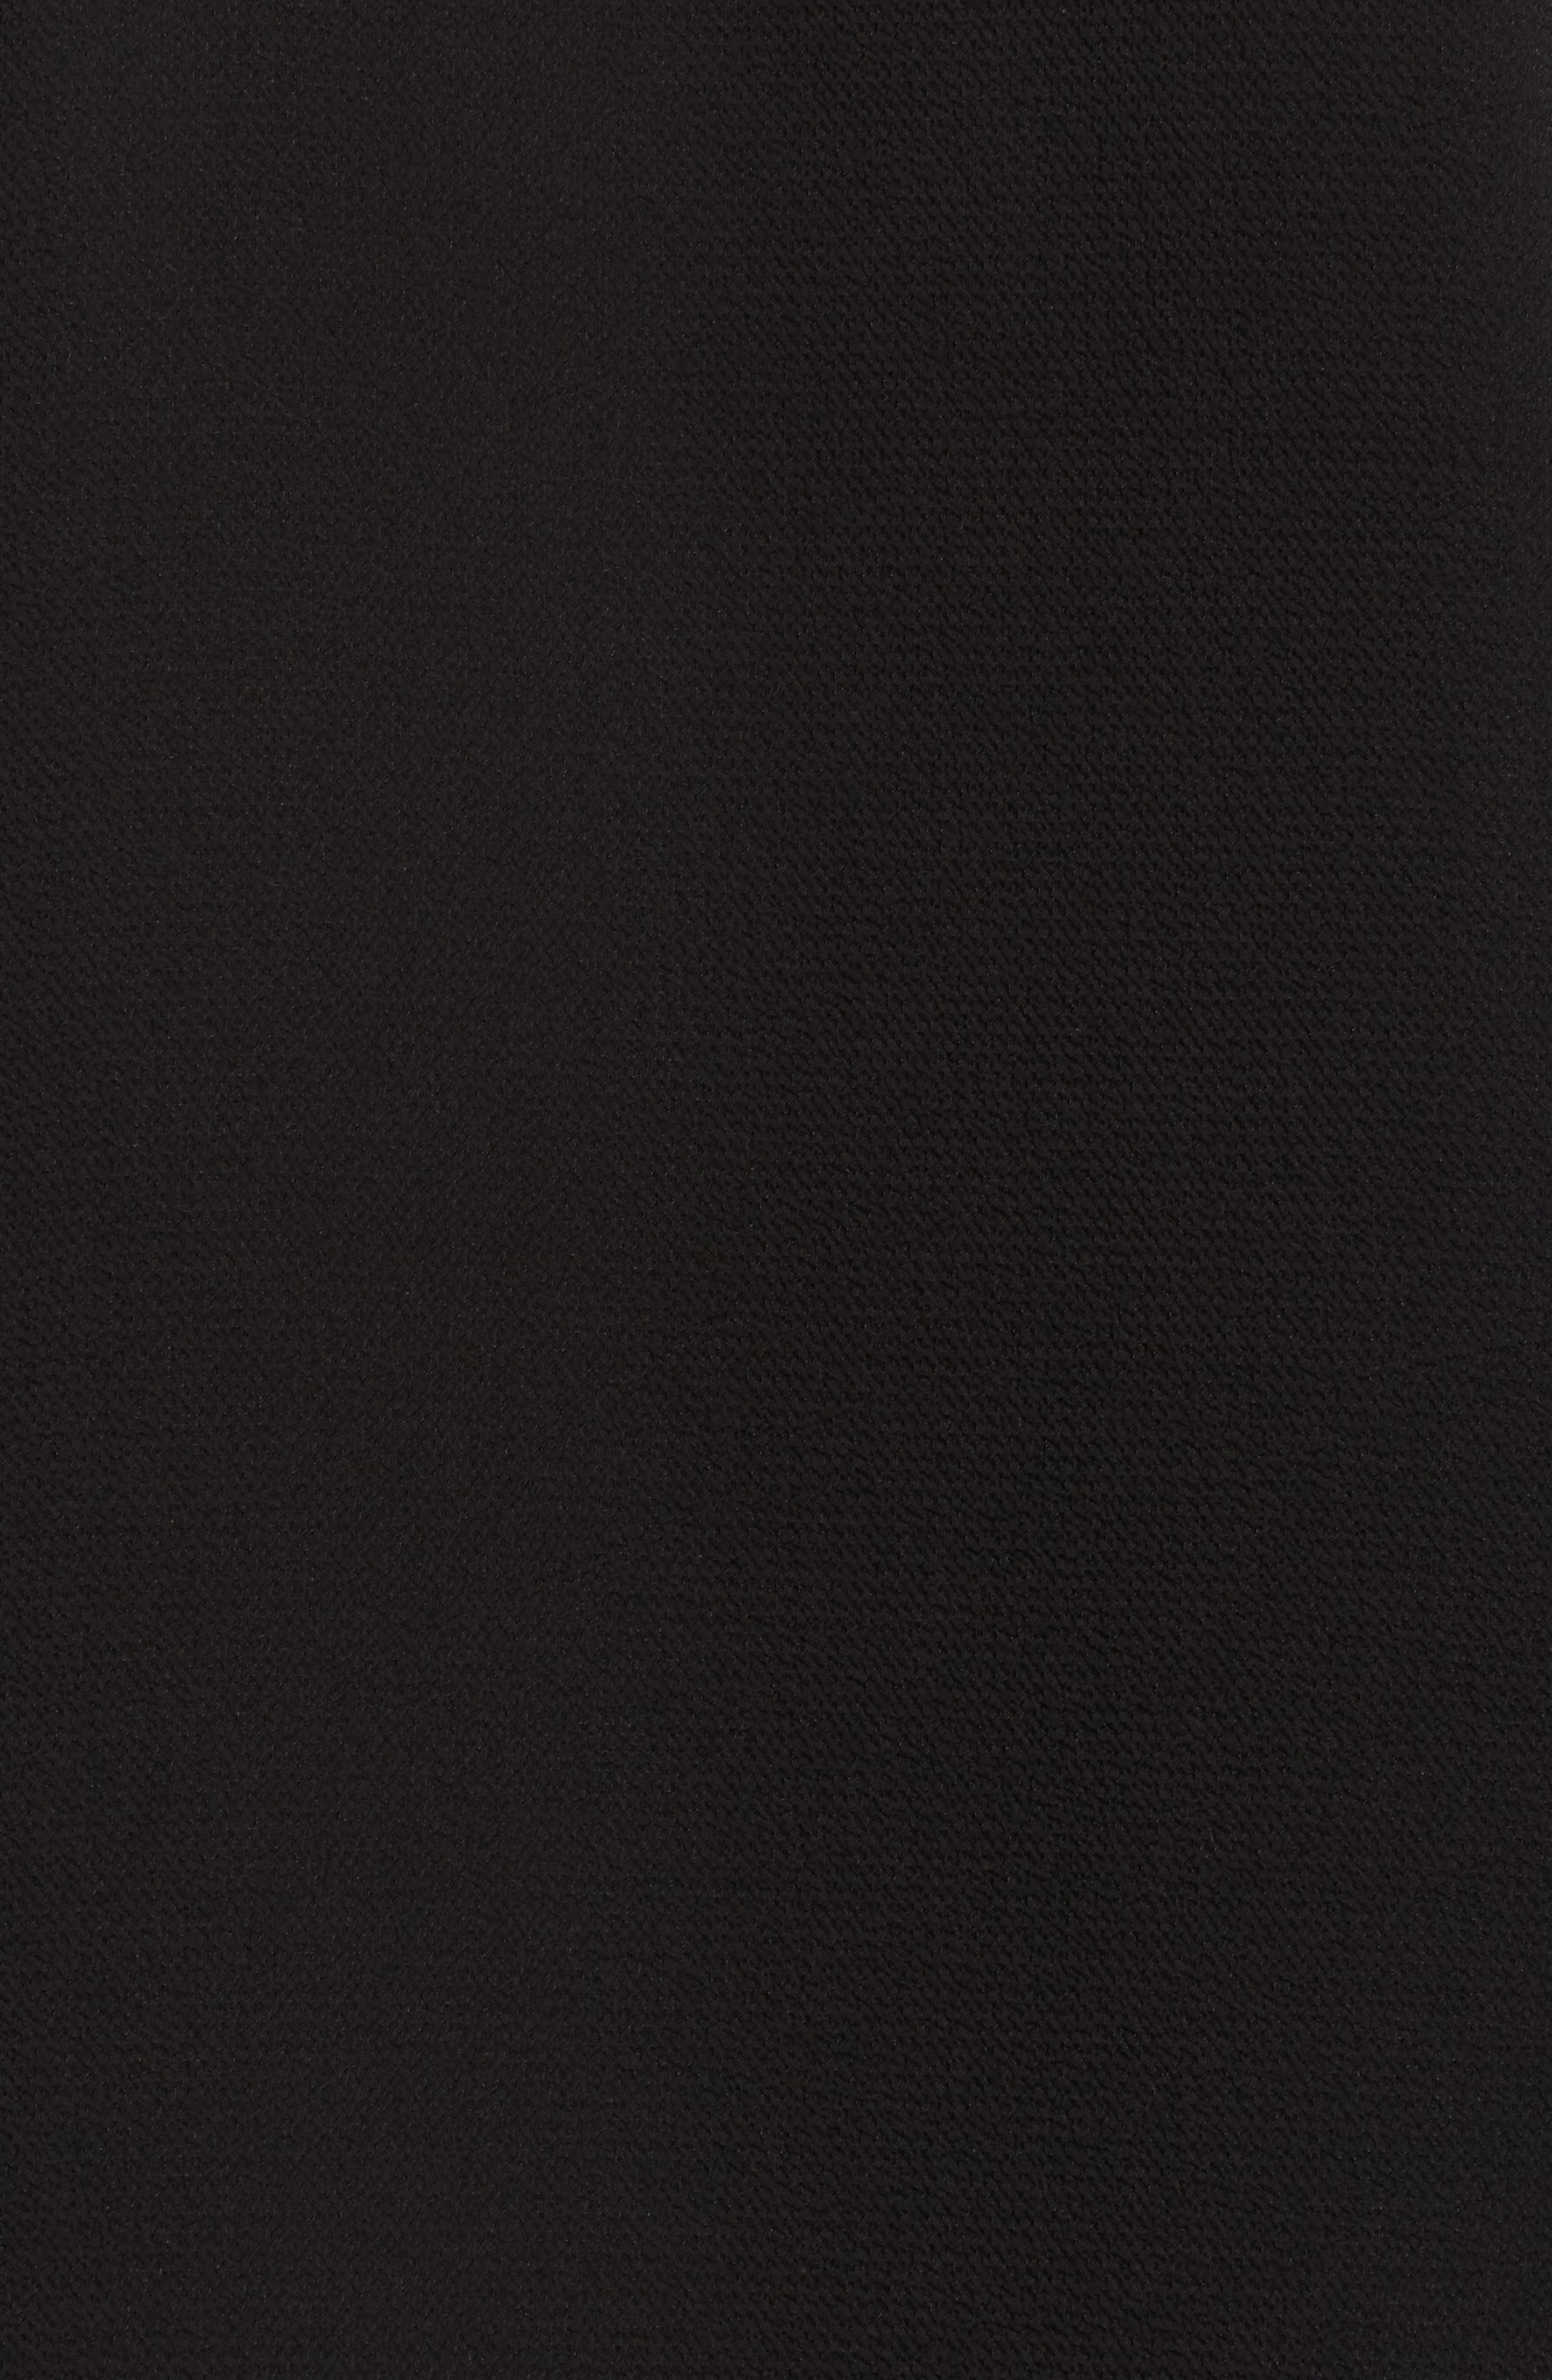 Ruffle Sleeve Pintuck Blouse,                             Alternate thumbnail 5, color,                             RICH BLACK